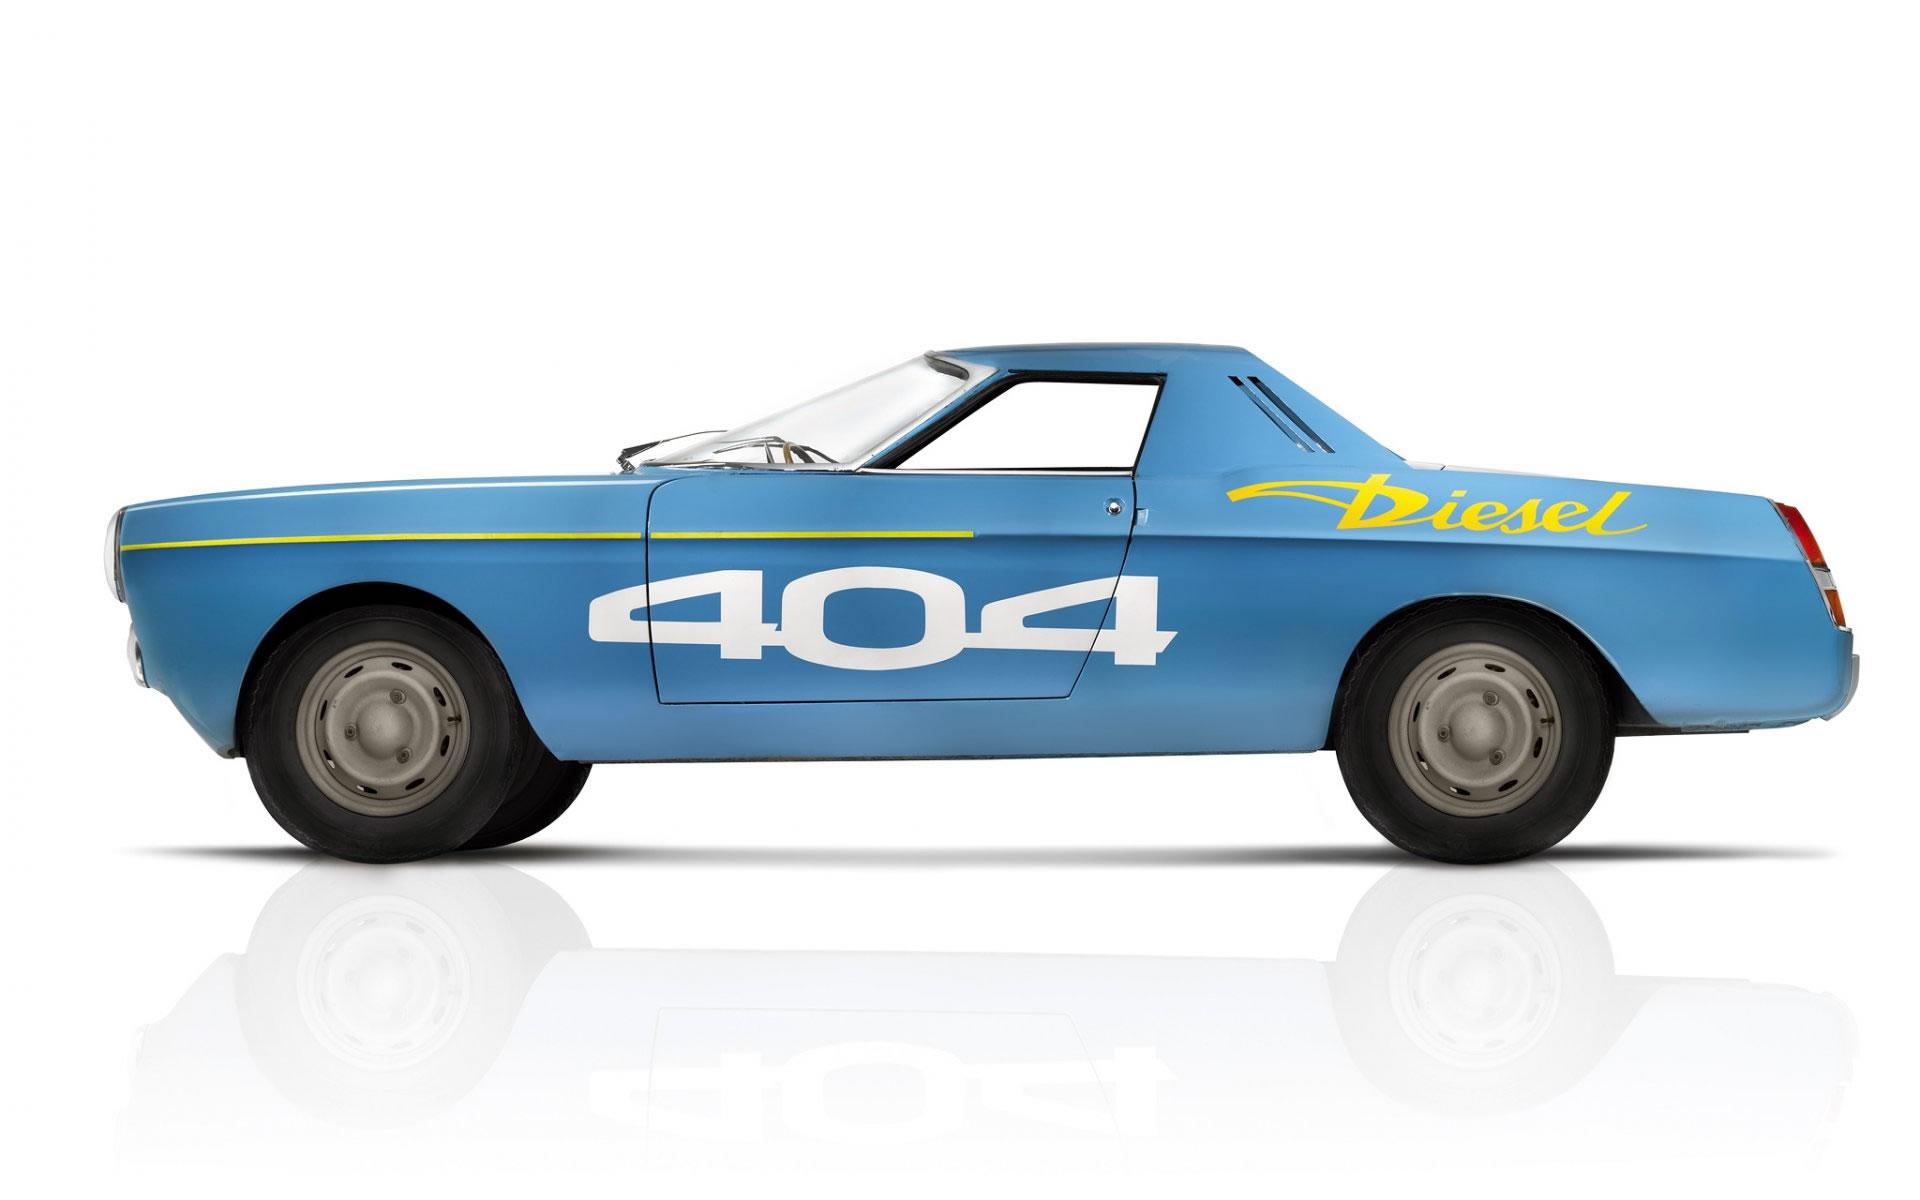 Peugeot 404 para fondo